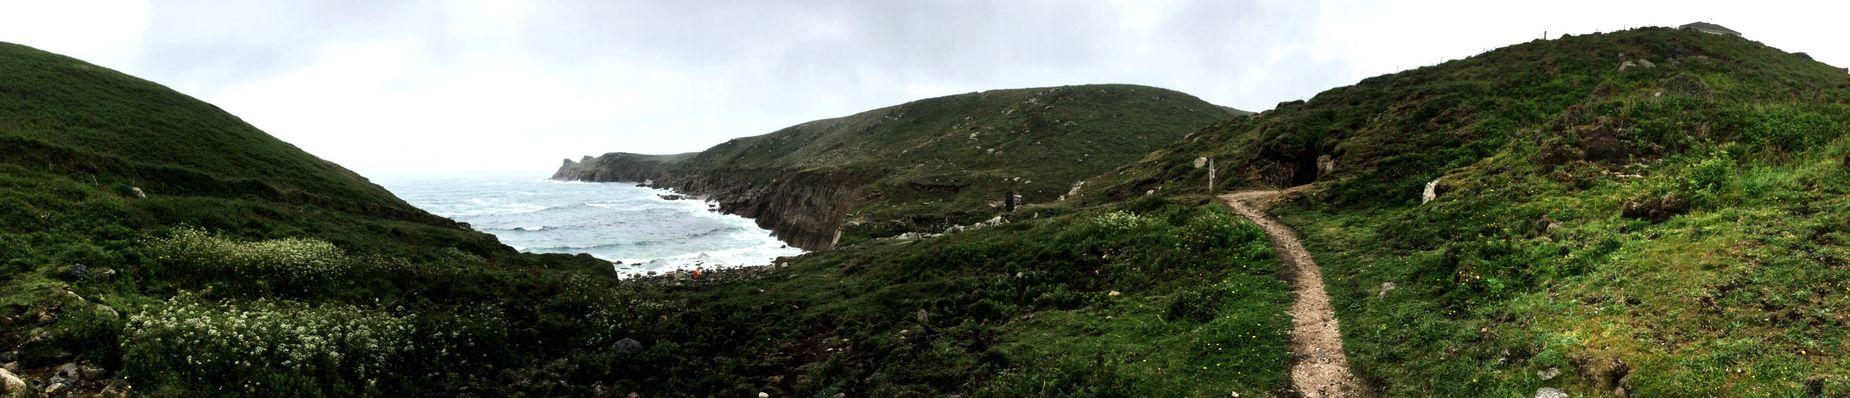 Cornwall Walks Foggy Cliffs Peace Tranquility